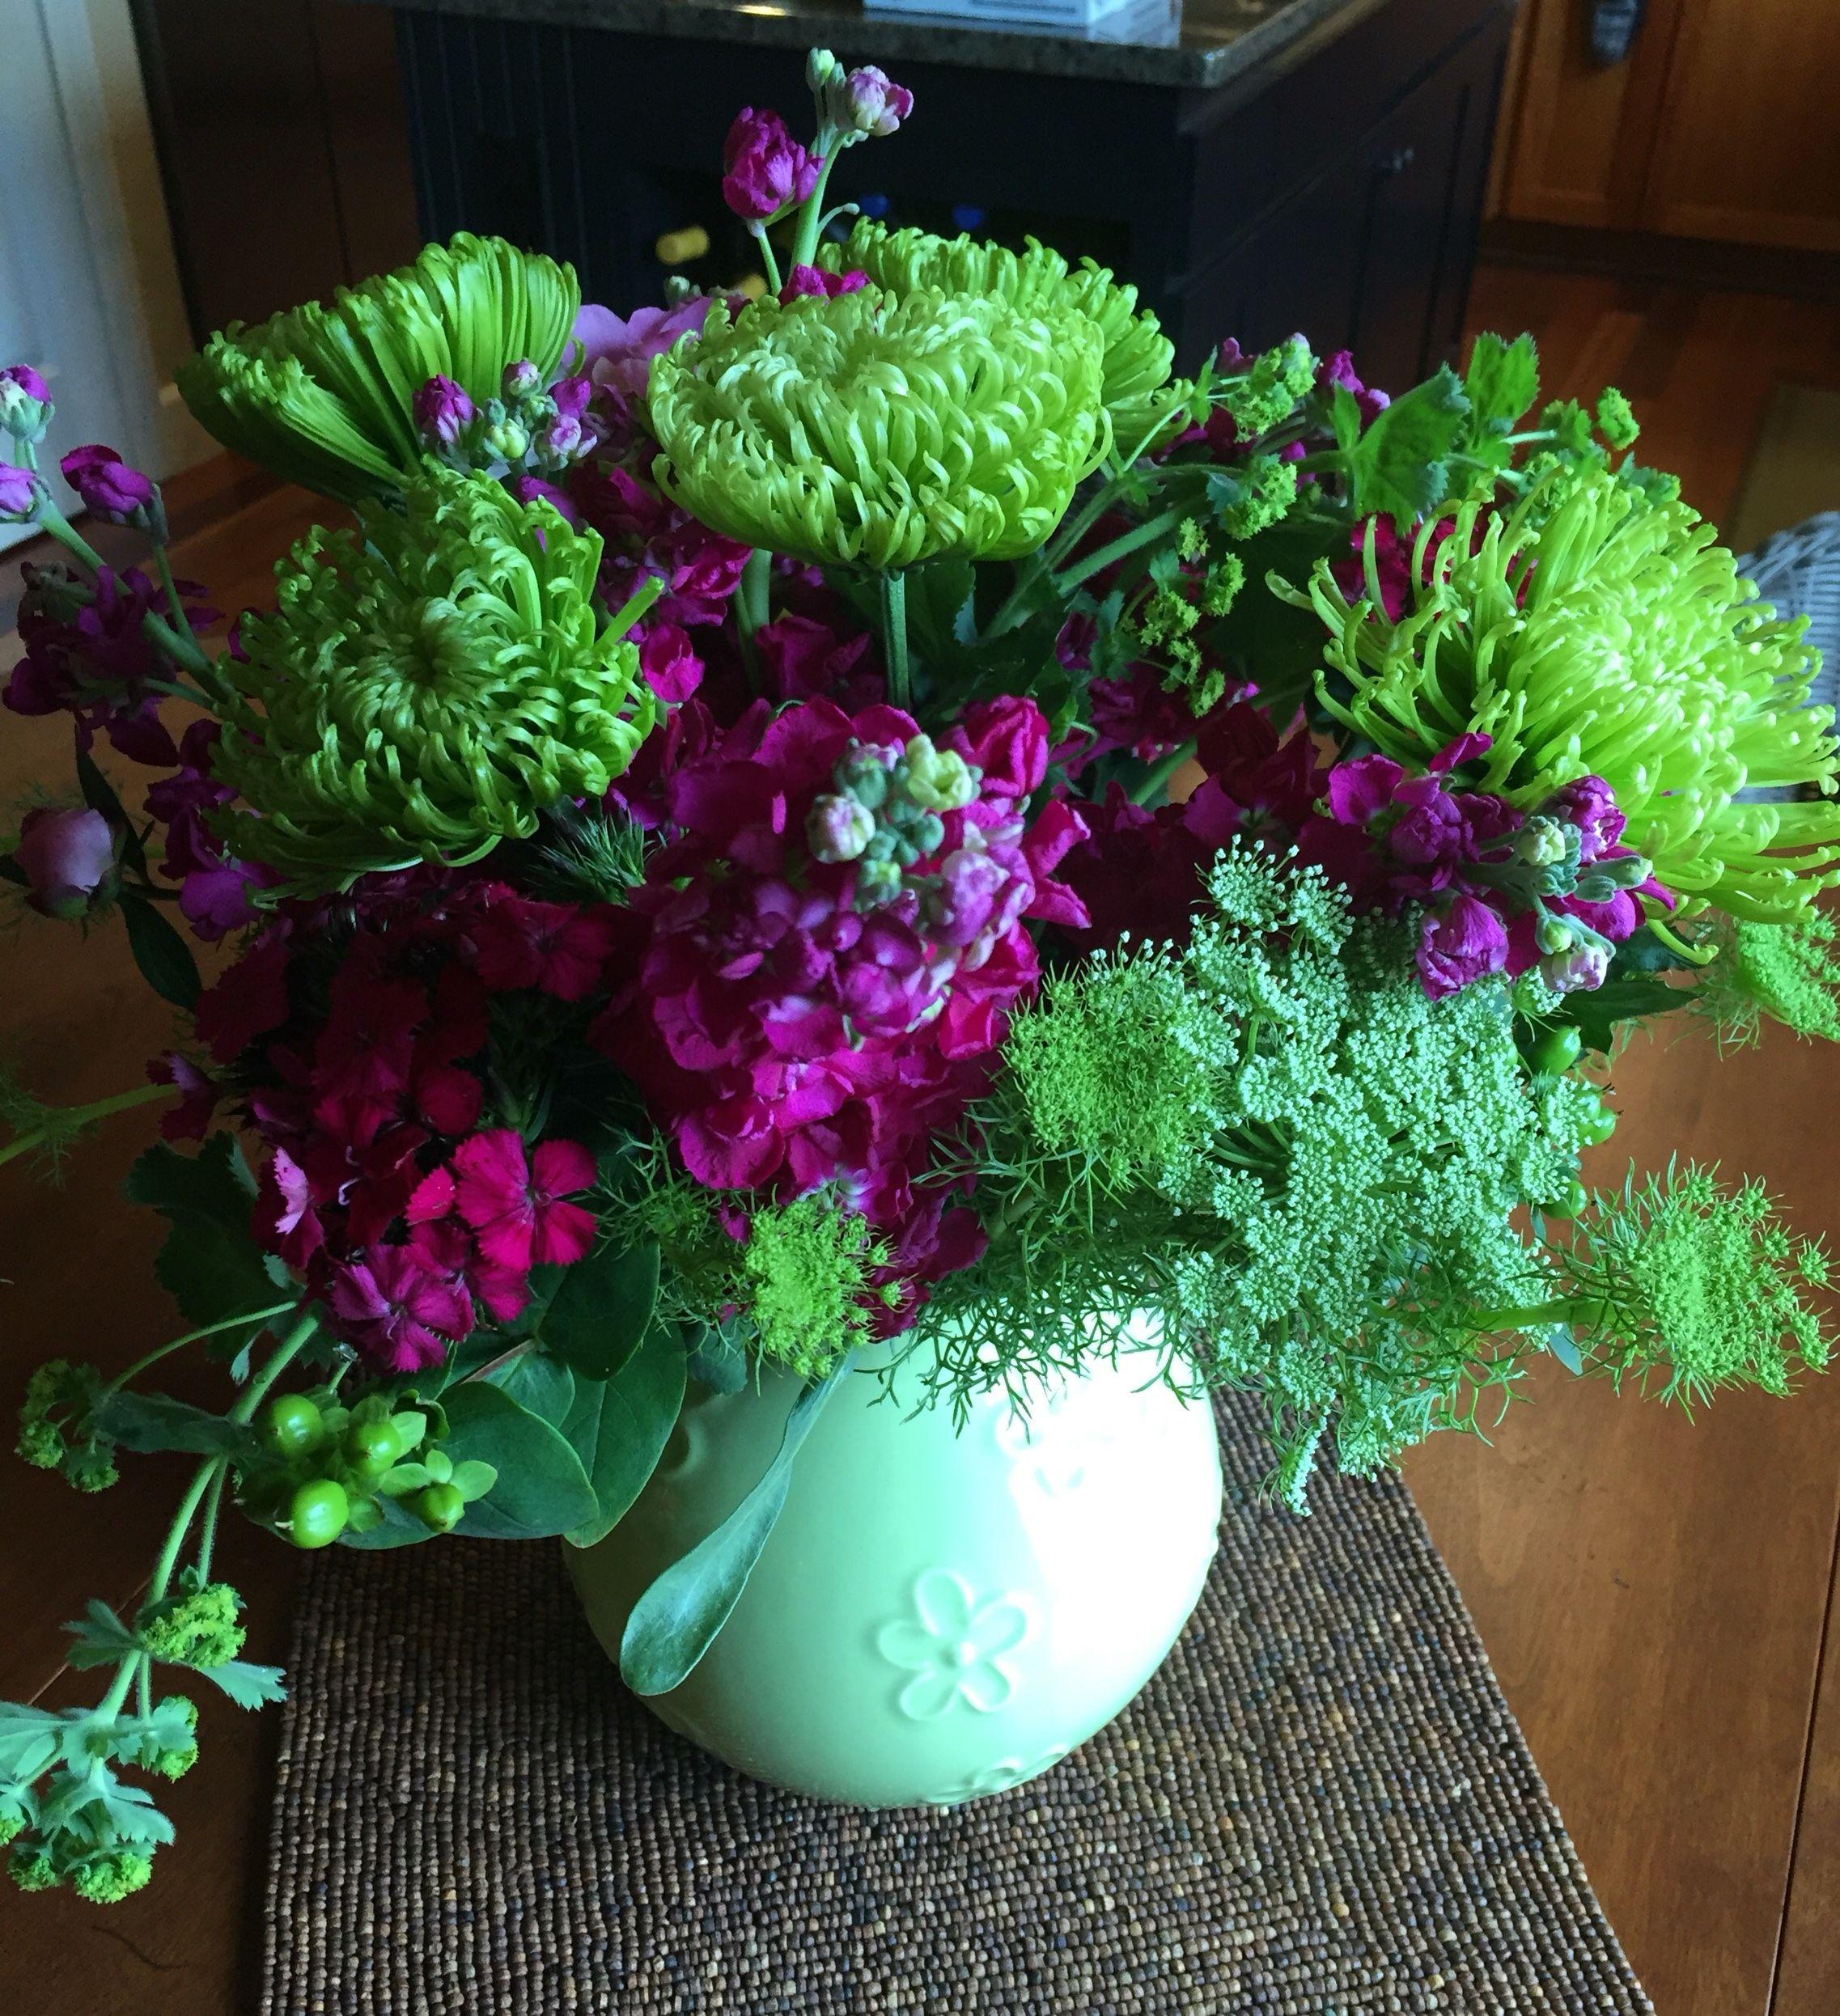 Pin de Cheryl Corwin en Floral | Pinterest | Florales, Arreglos ...